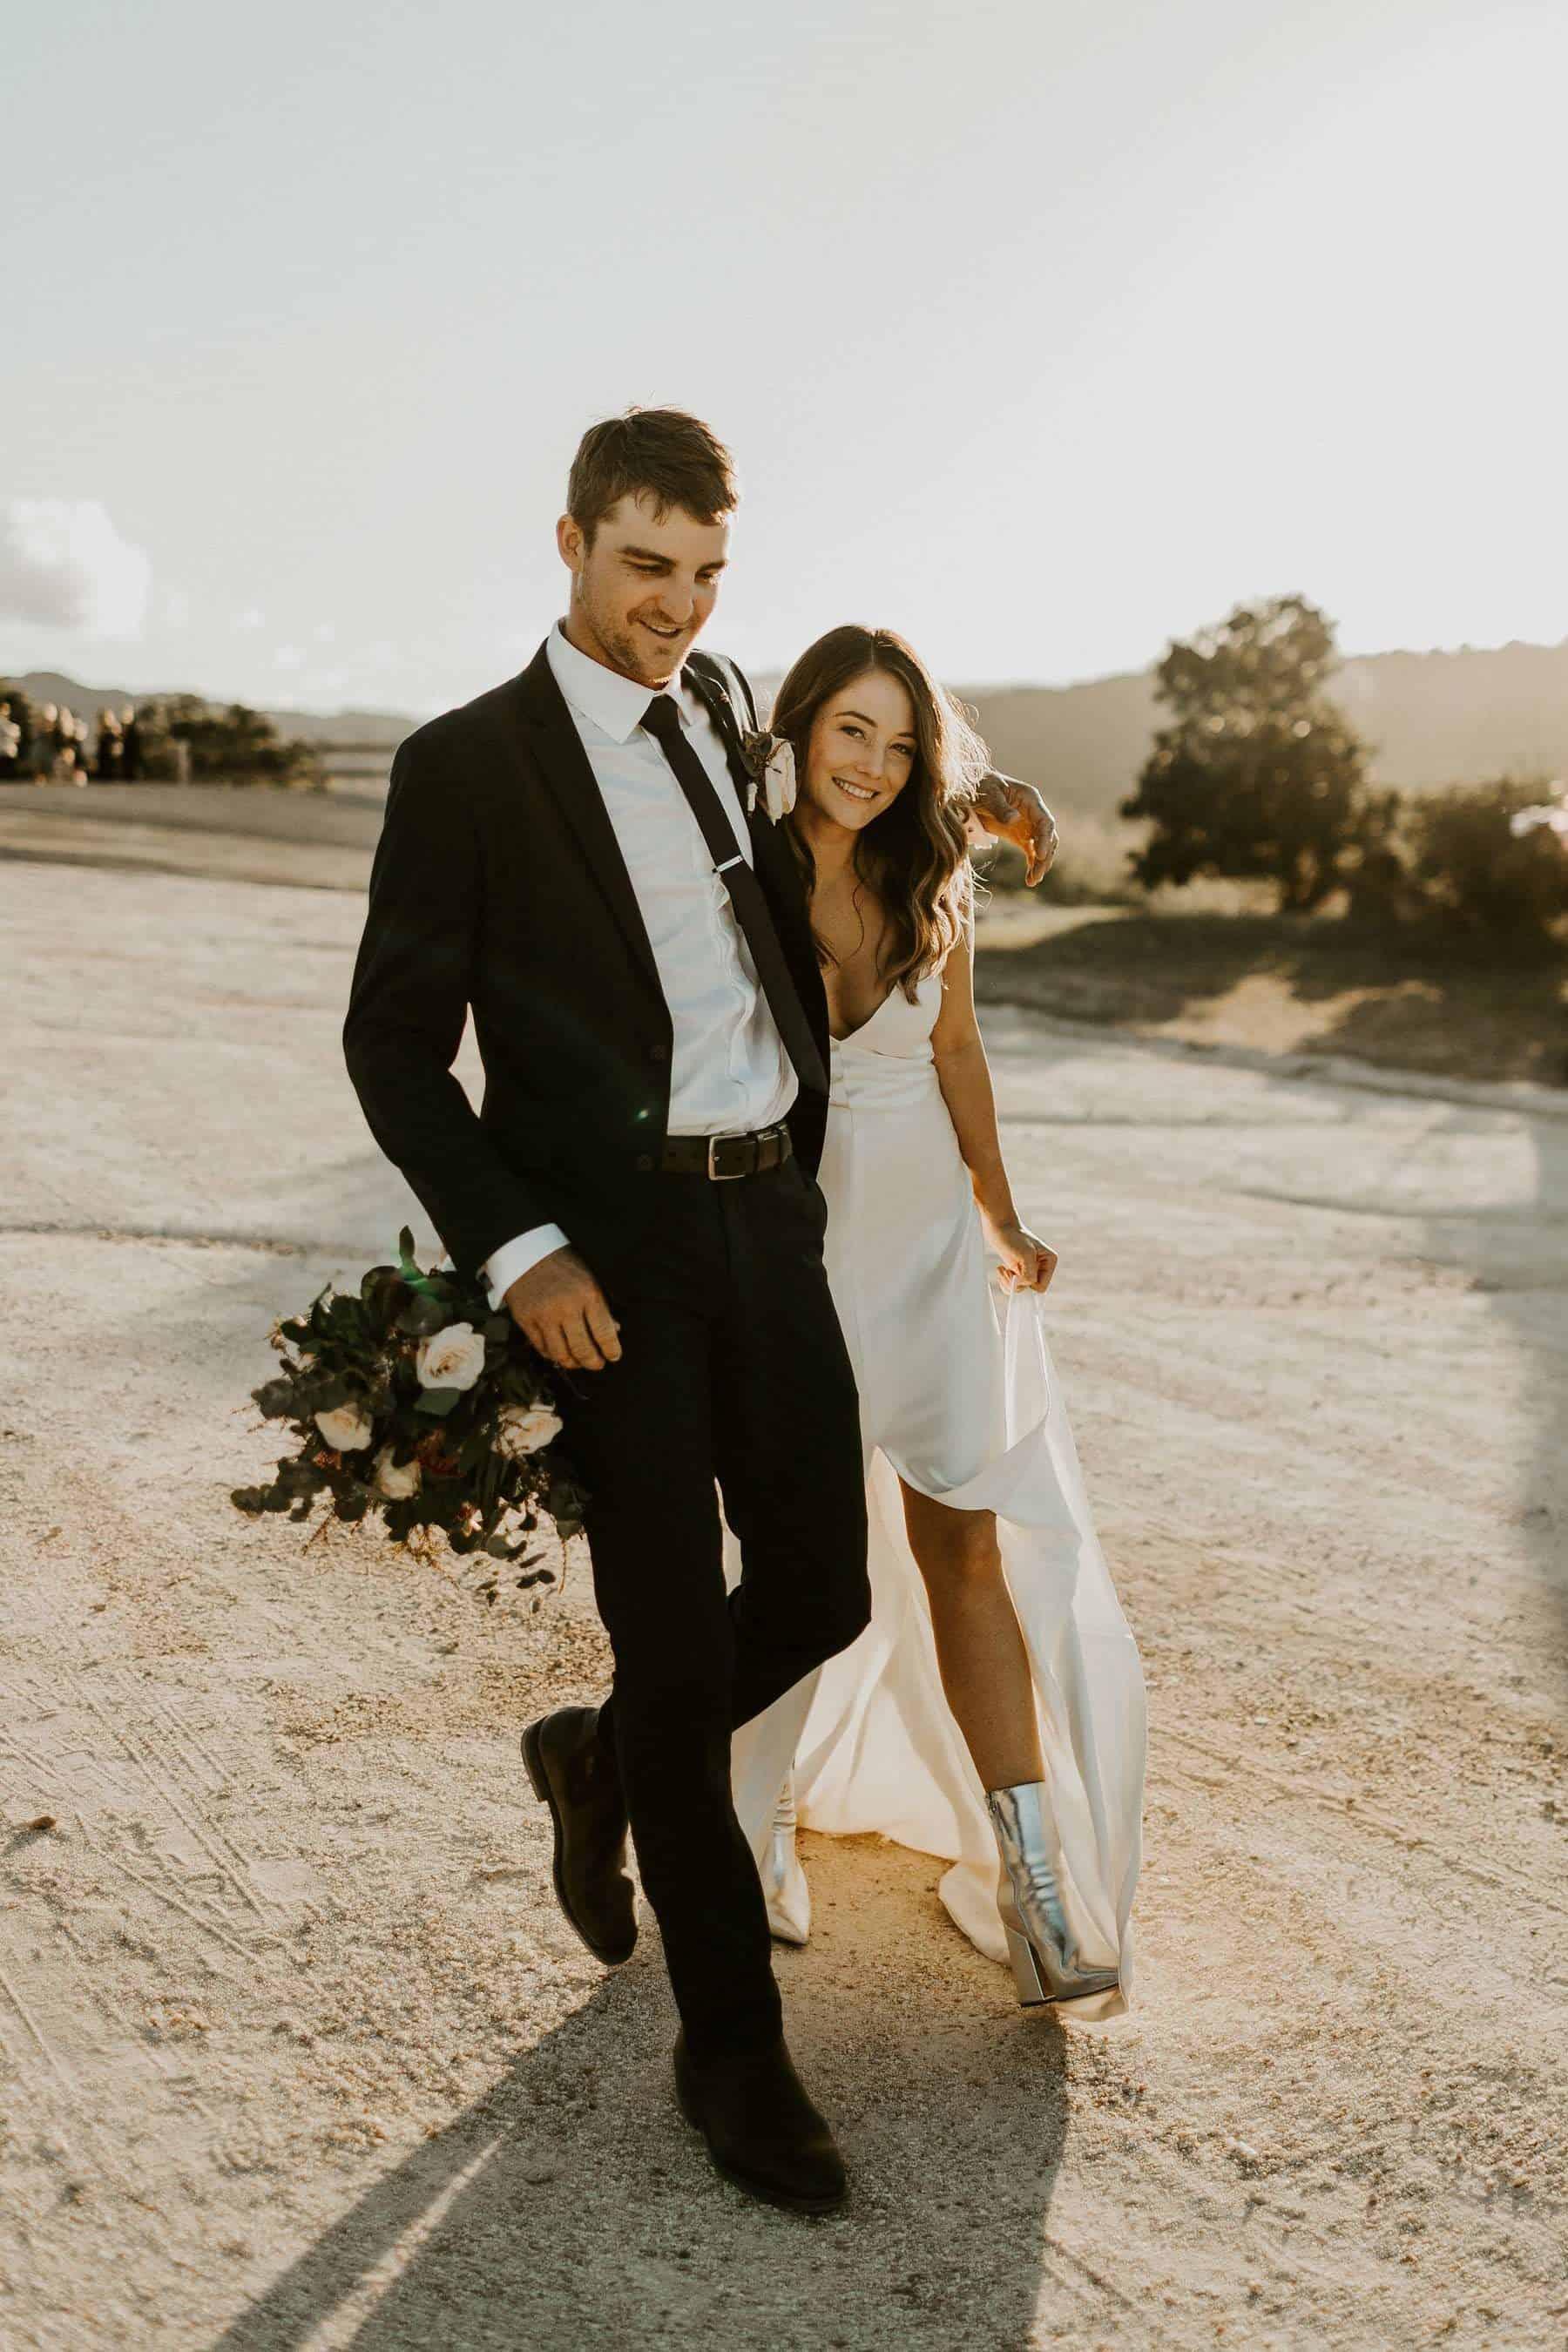 Best wedding dresses of 2019 - simple silk slip gown